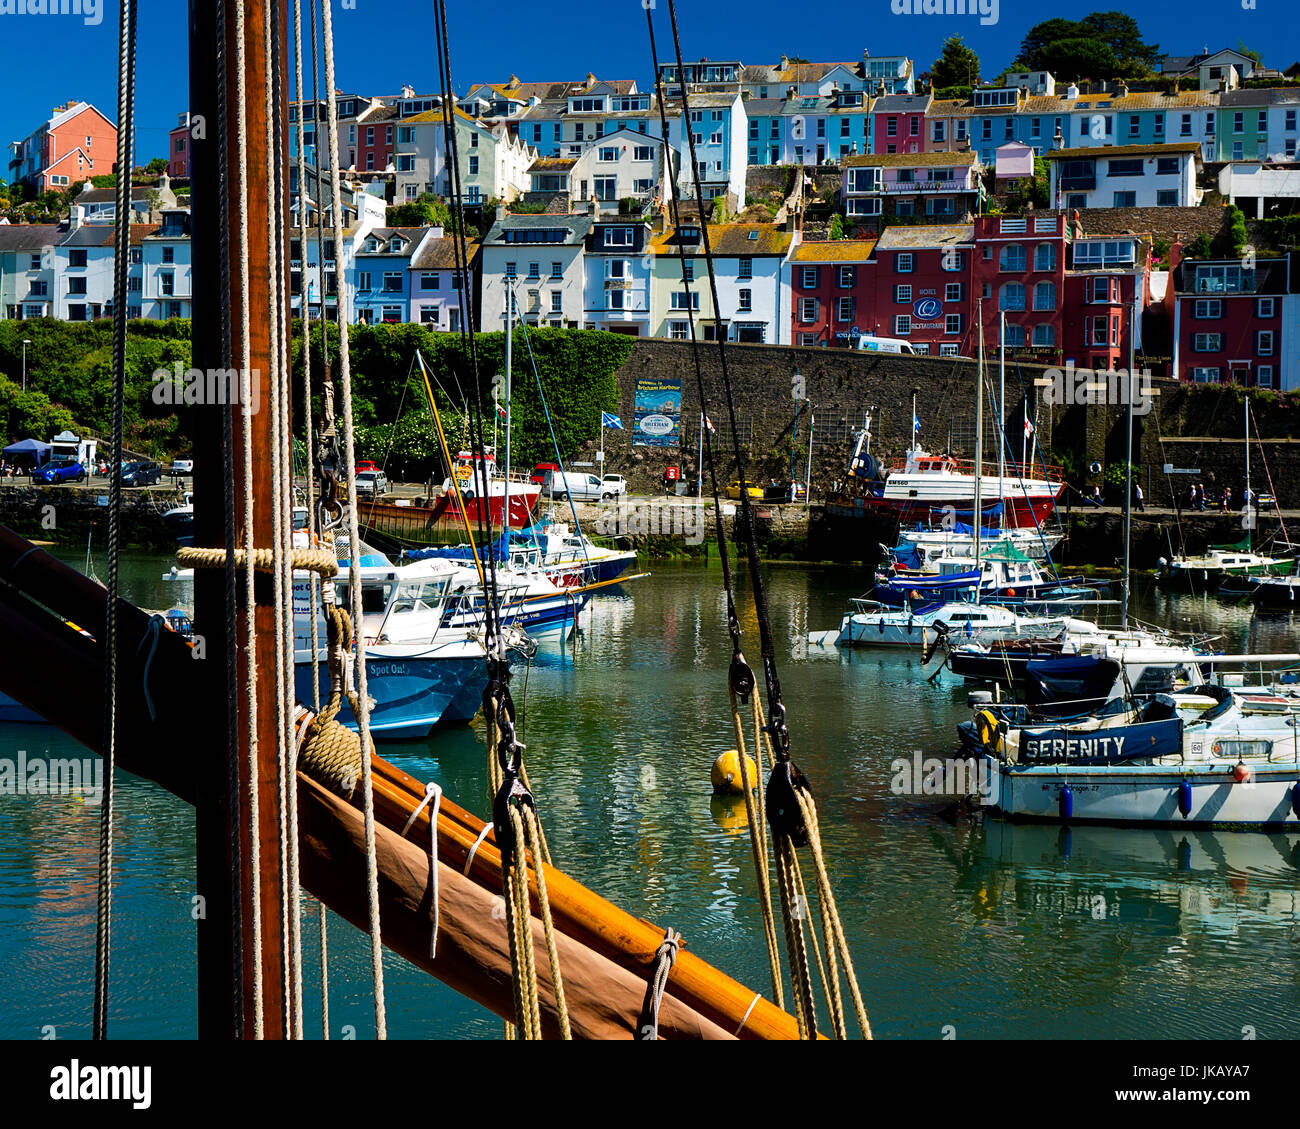 GB - DEVON: Brixham Harbour View - Stock Image